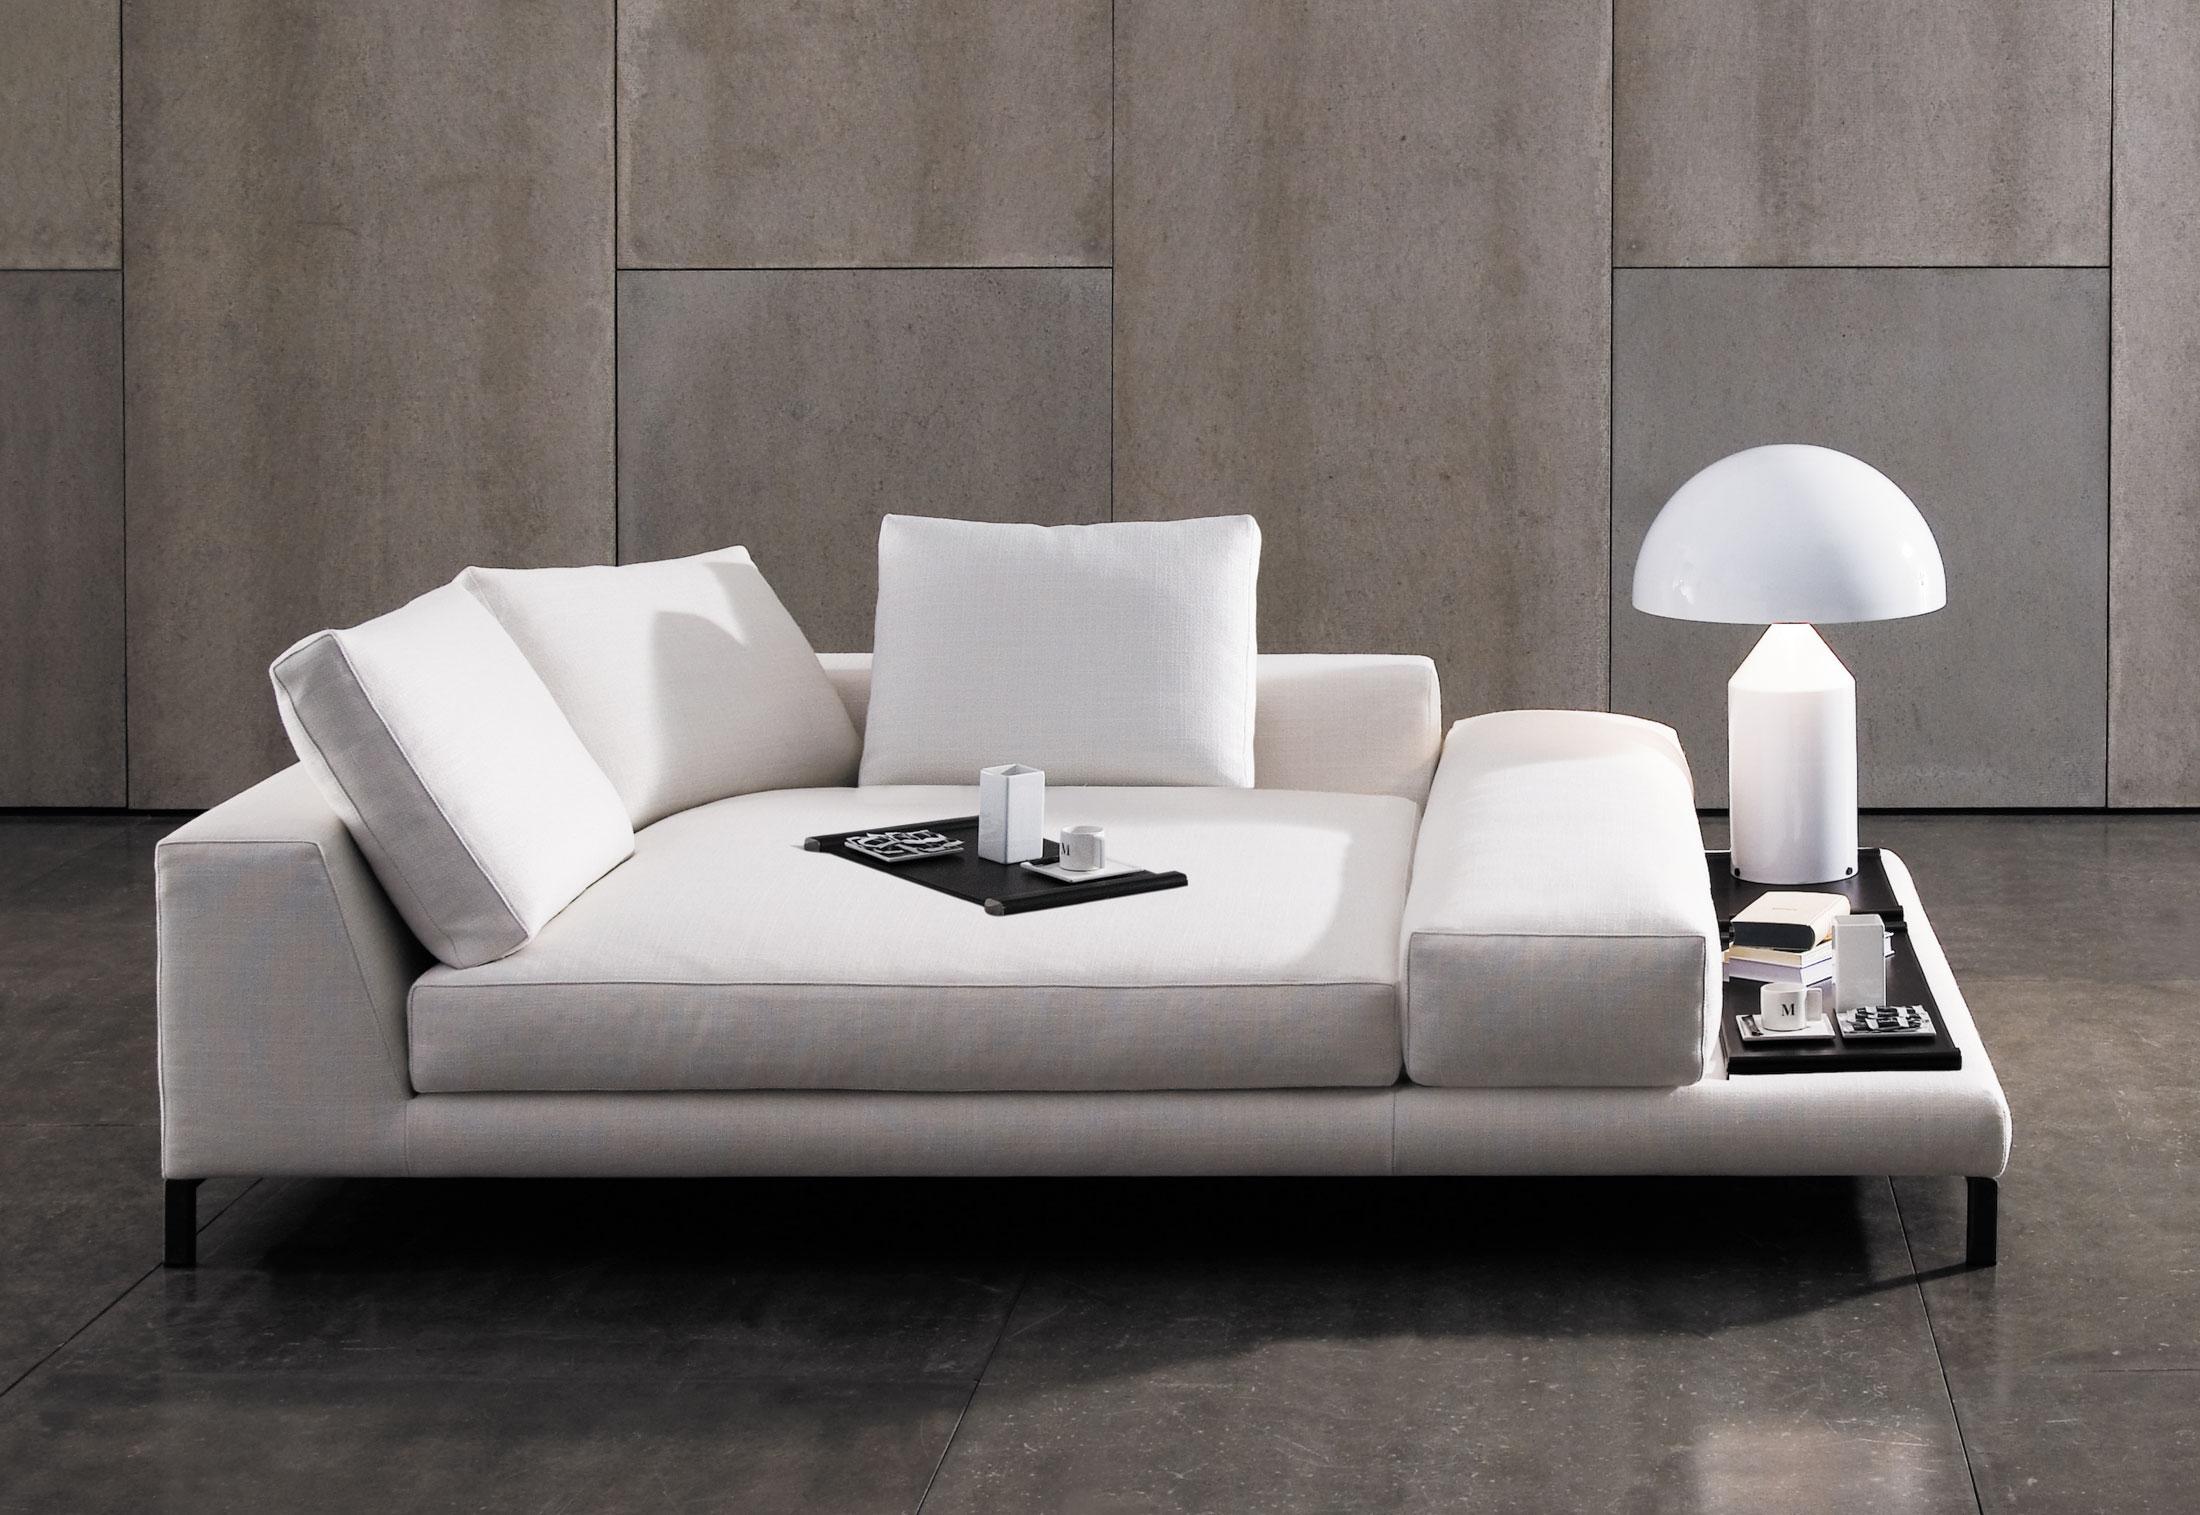 how to make sofa covers bassett kennedy hamilton islands by minotti | stylepark